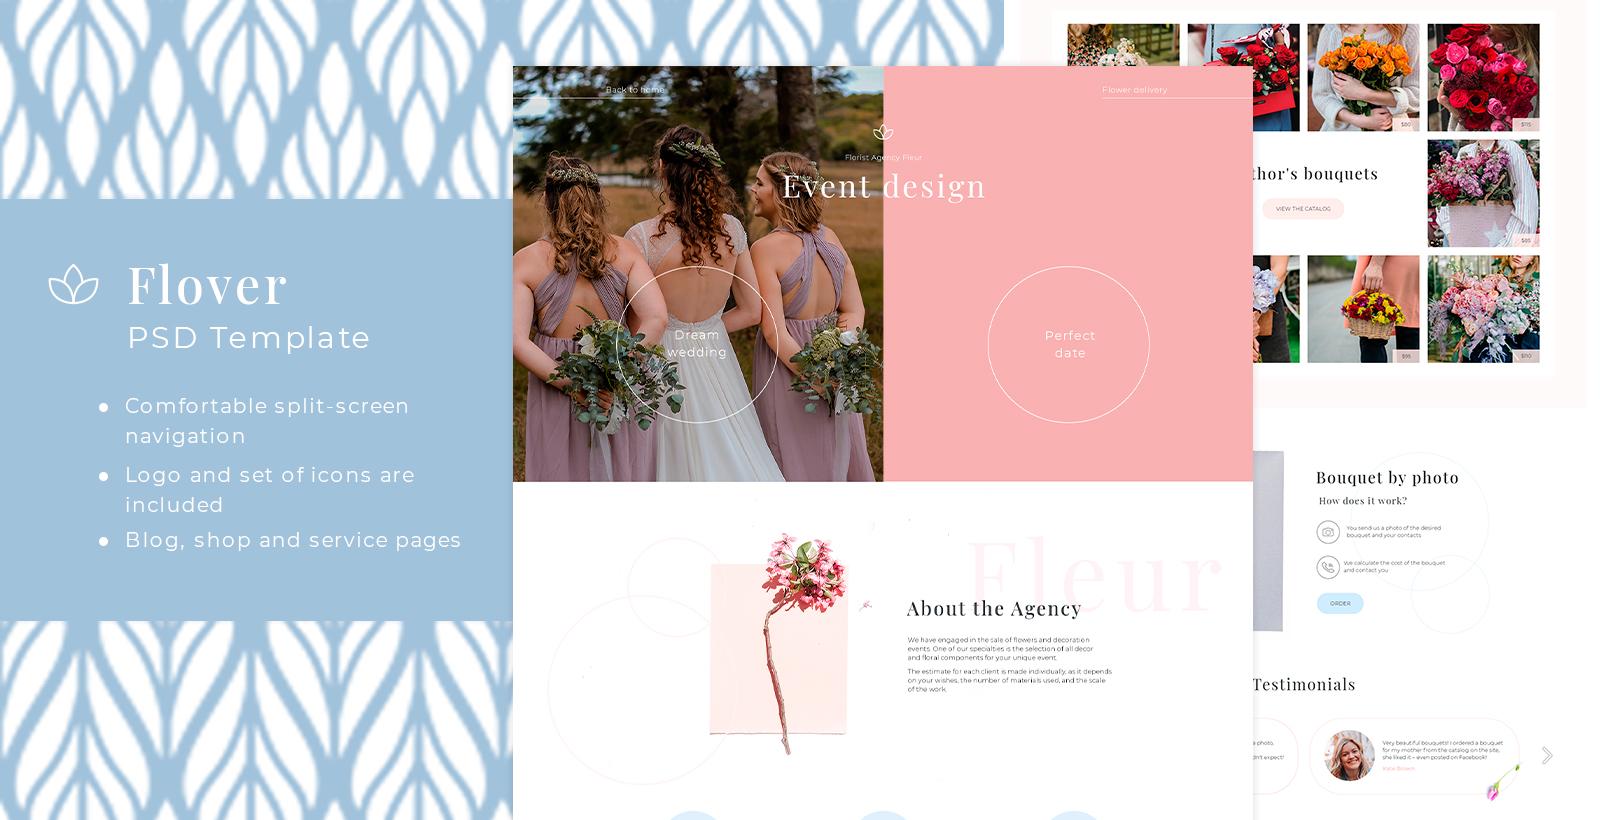 Plantilla para psd - Categoría: Flores - versión para Desktop